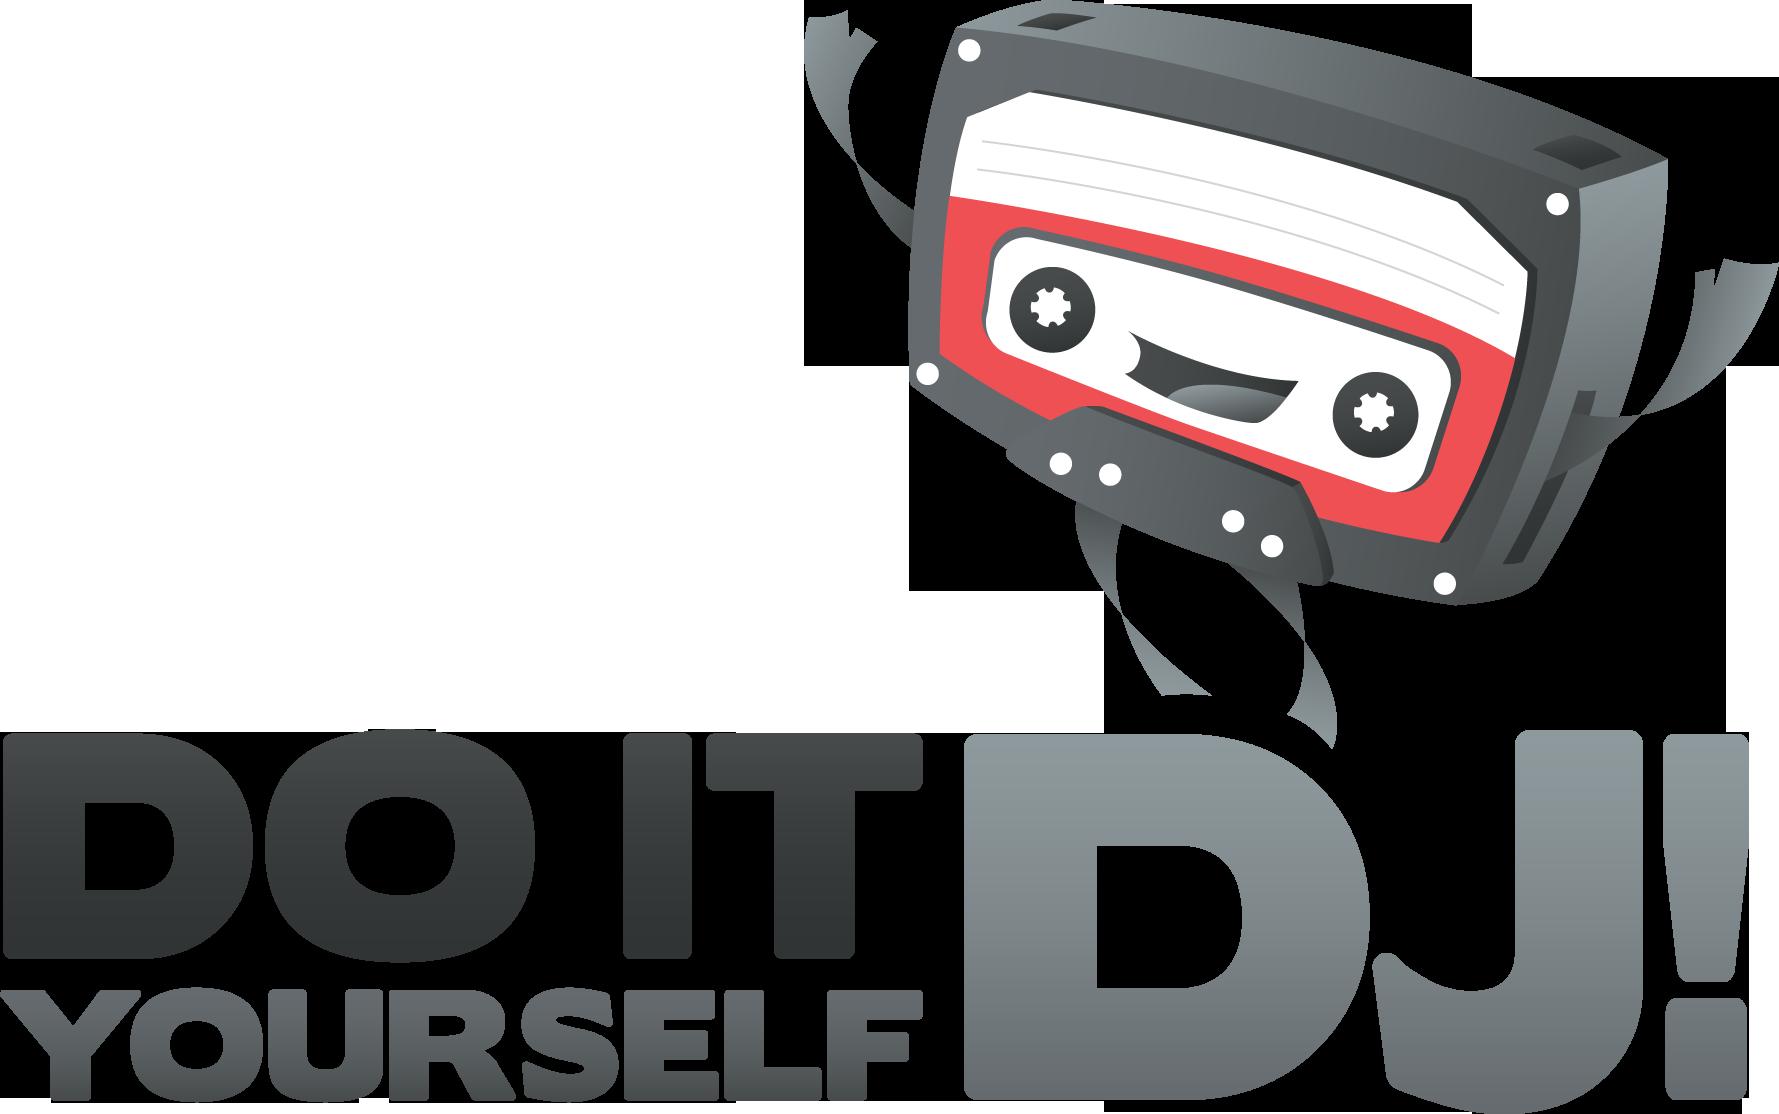 DIY_DJ_logo.png